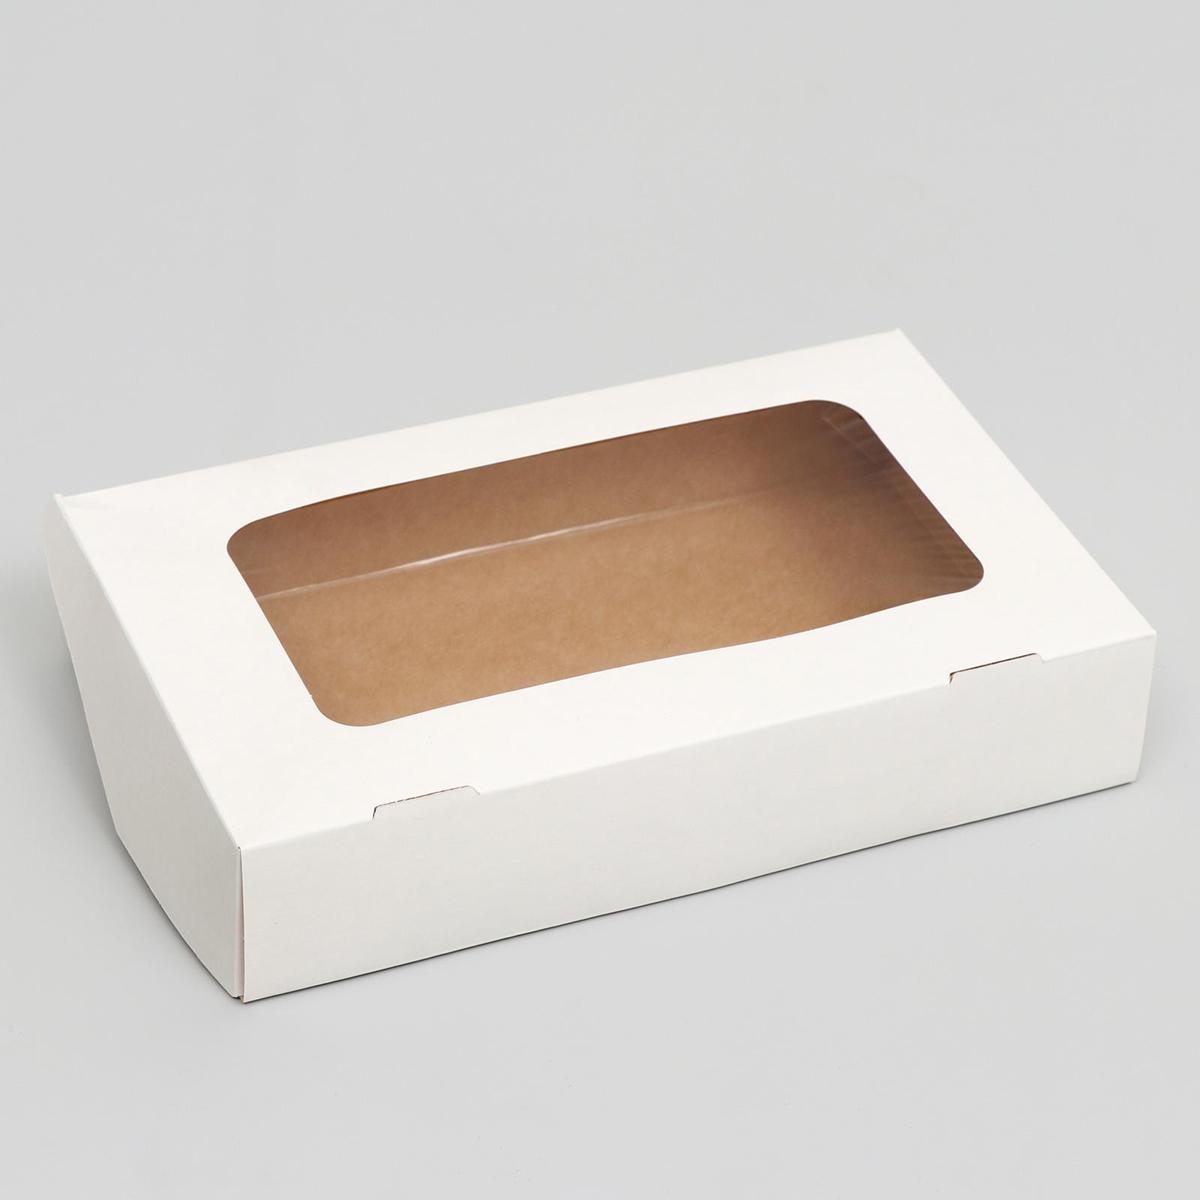 4992133 Контейнер белый, 20*12*4 см